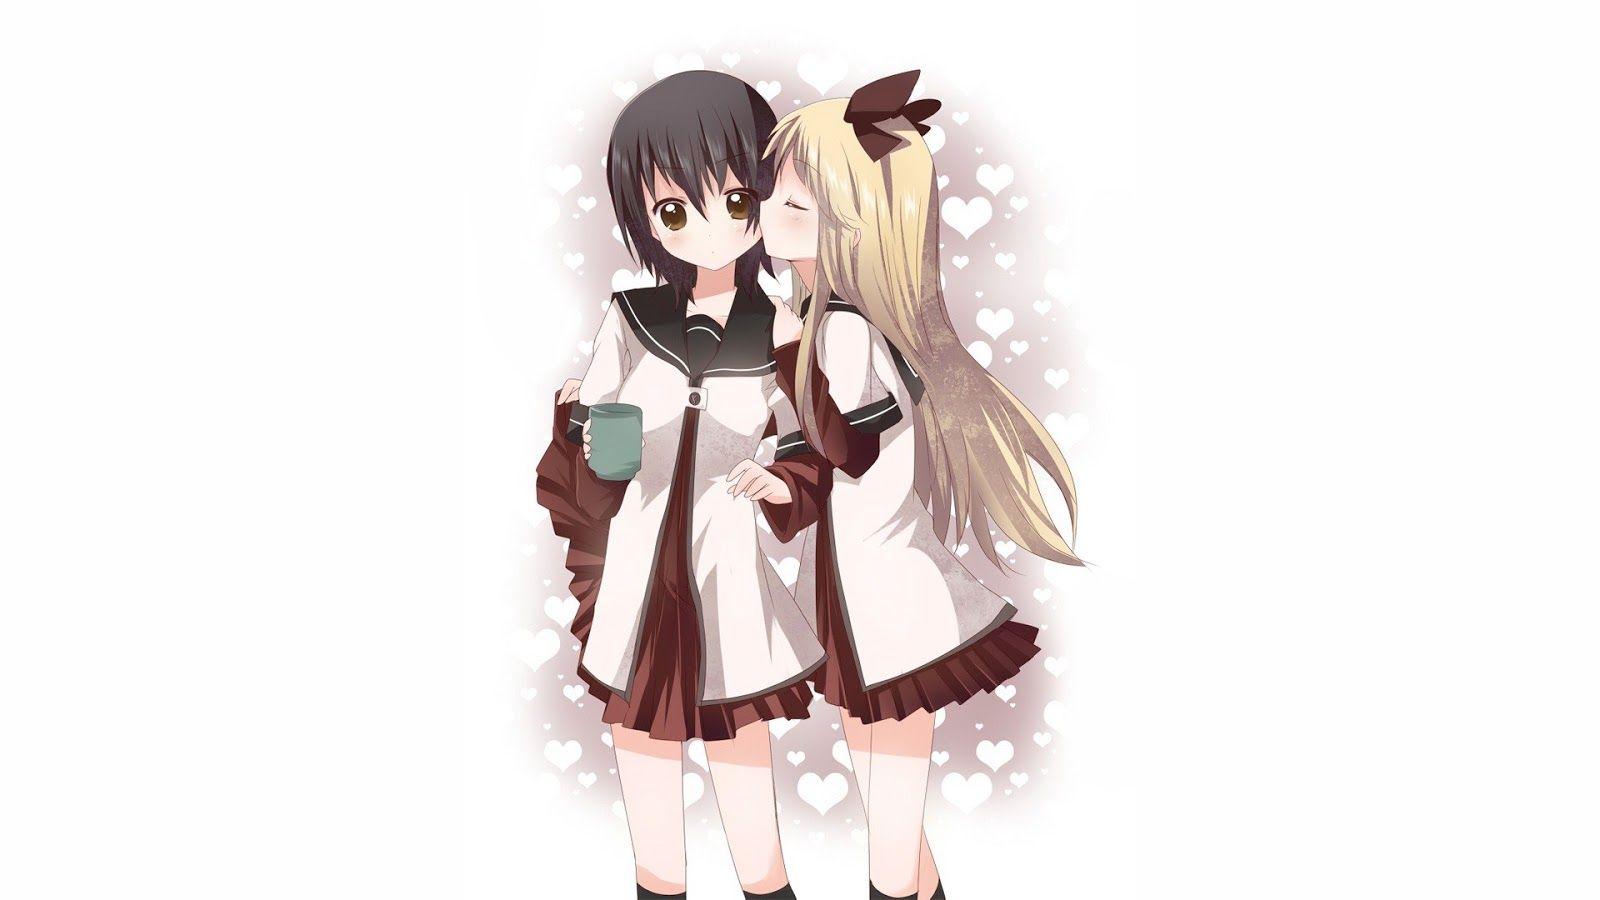 Anime Wallpapers Yuru Yuri